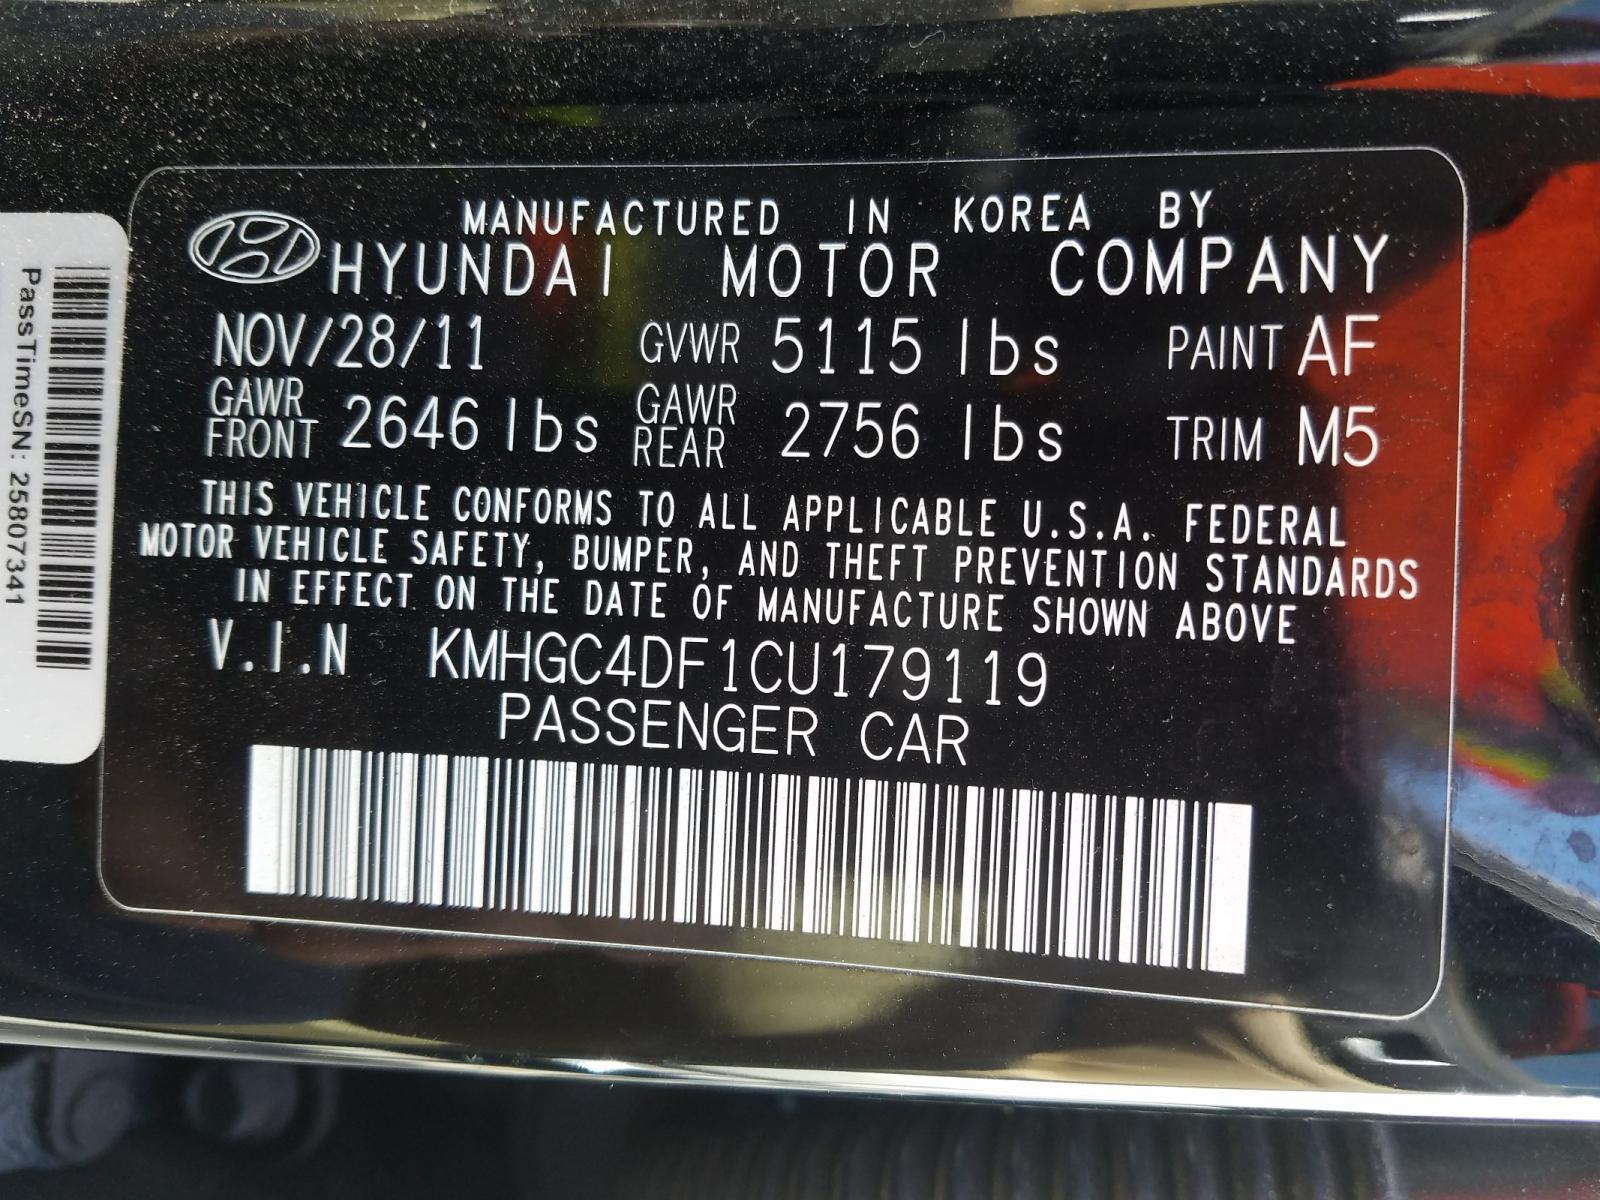 2012 Hyundai Genesis 4. 4.6L